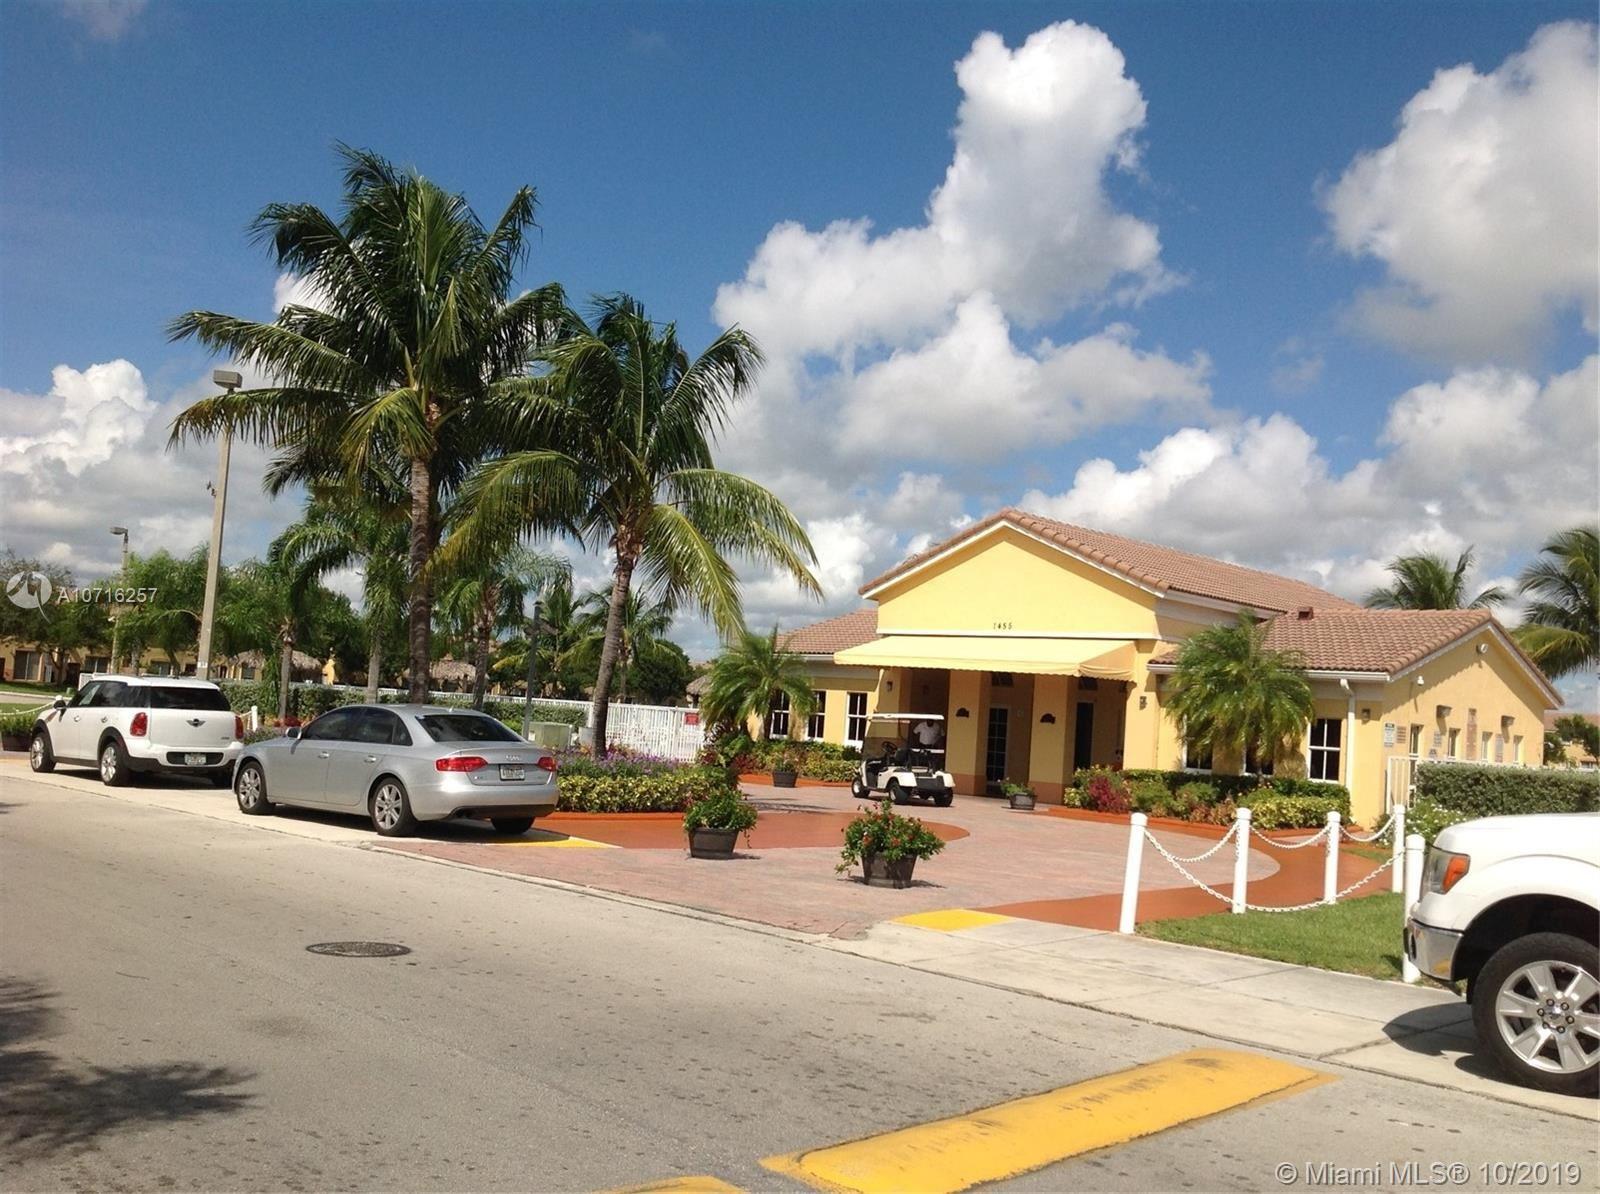 1658 SE 28 court #200, Homestead, FL 33035 - MLS#: A10716257